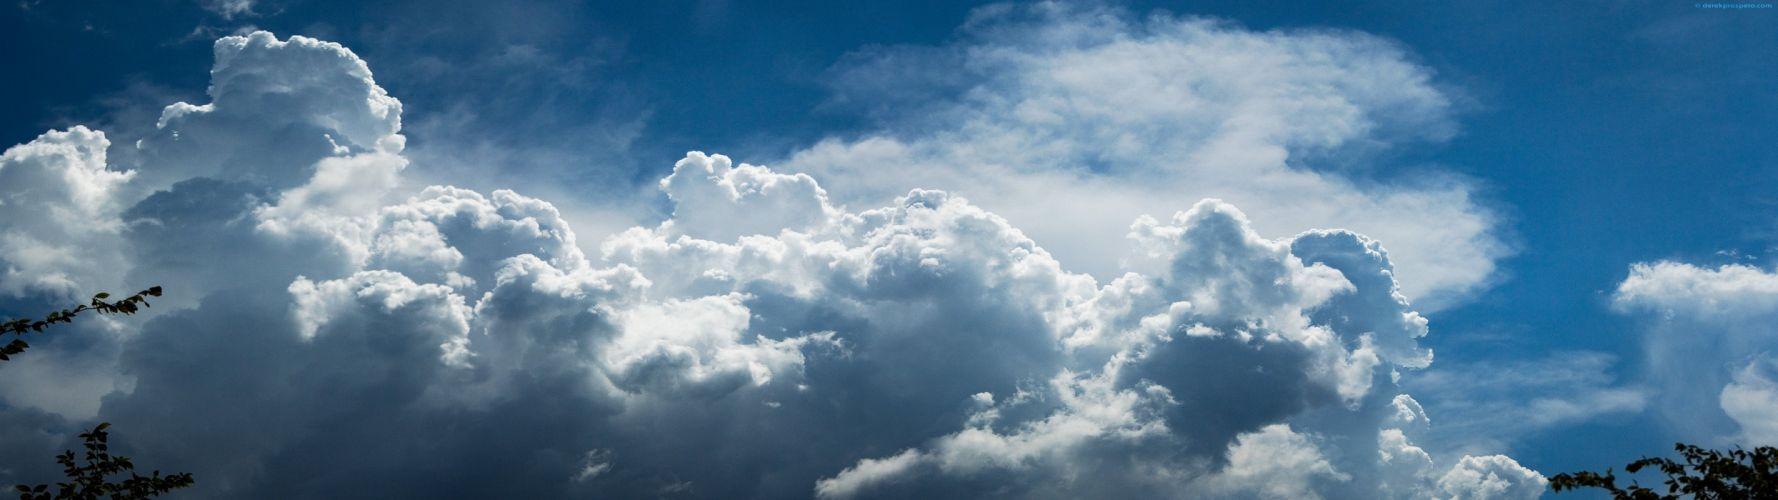 clouds skylines wallpaper